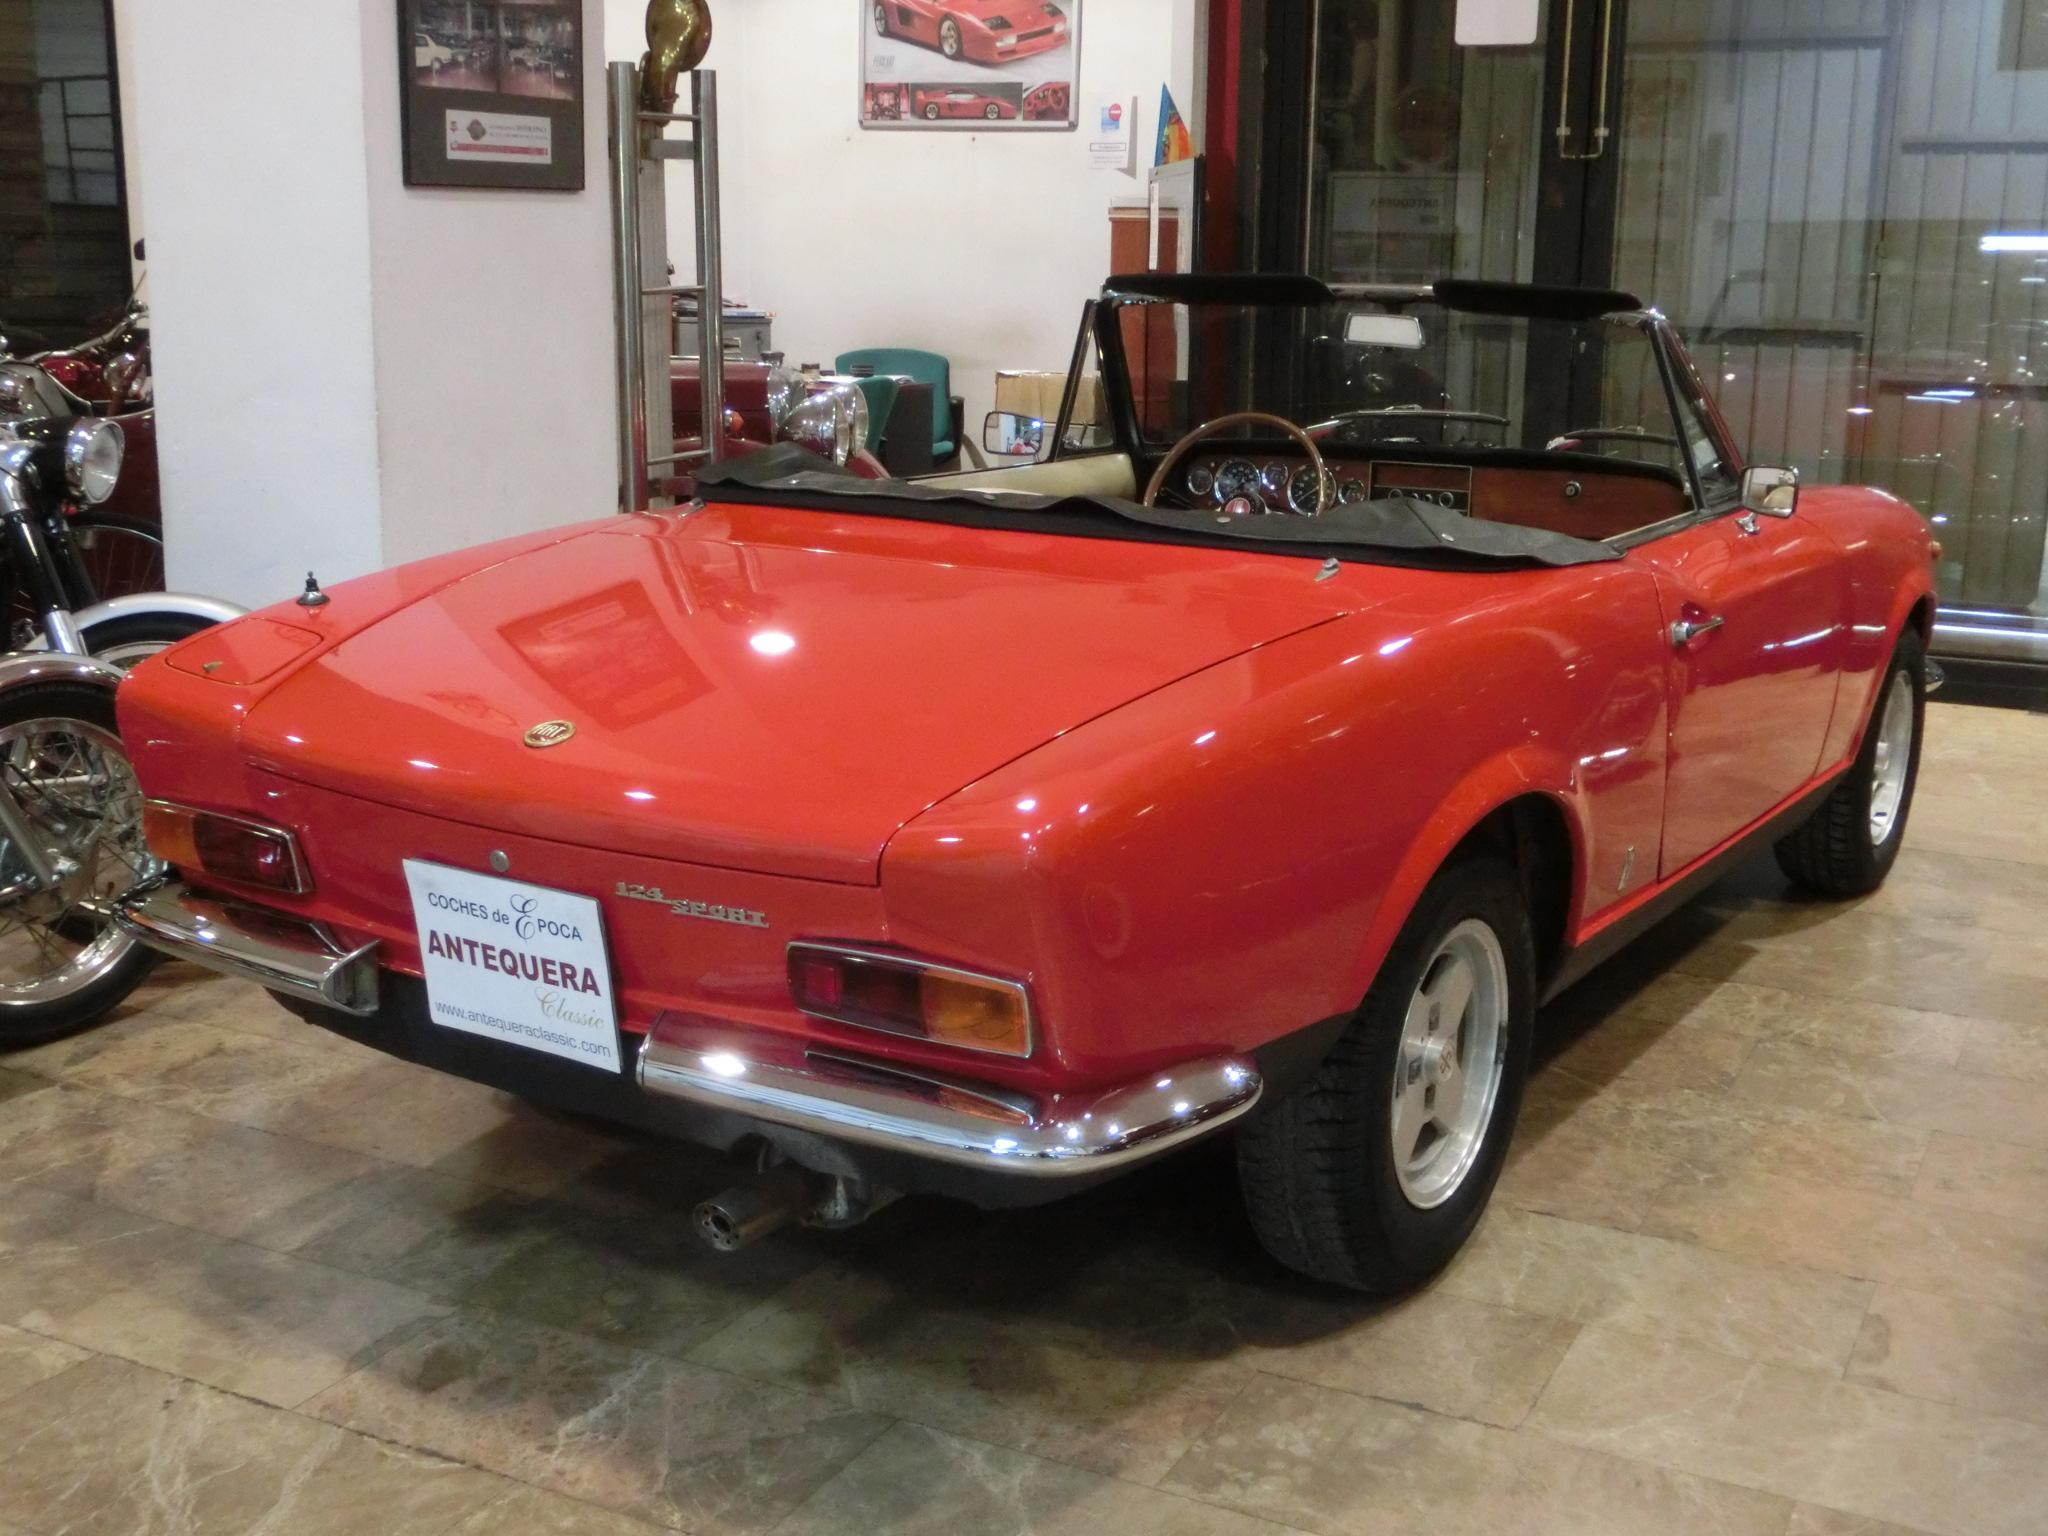 Fiat 124 Sport Spider 1600 Les Annonces Collection 1971 Full